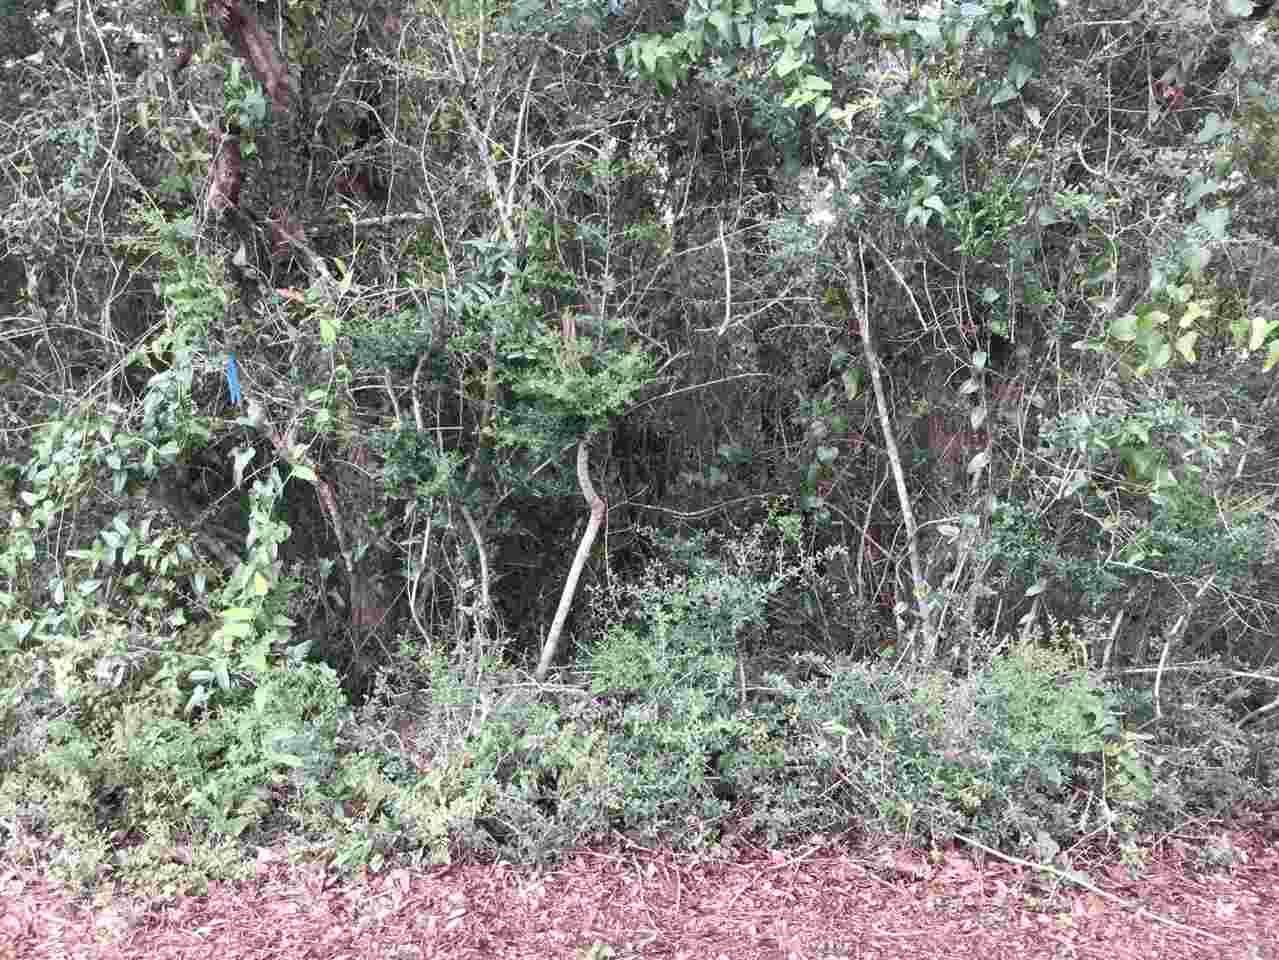 Lot 45 Andrew Jackson Dr, Pace, FL 32571